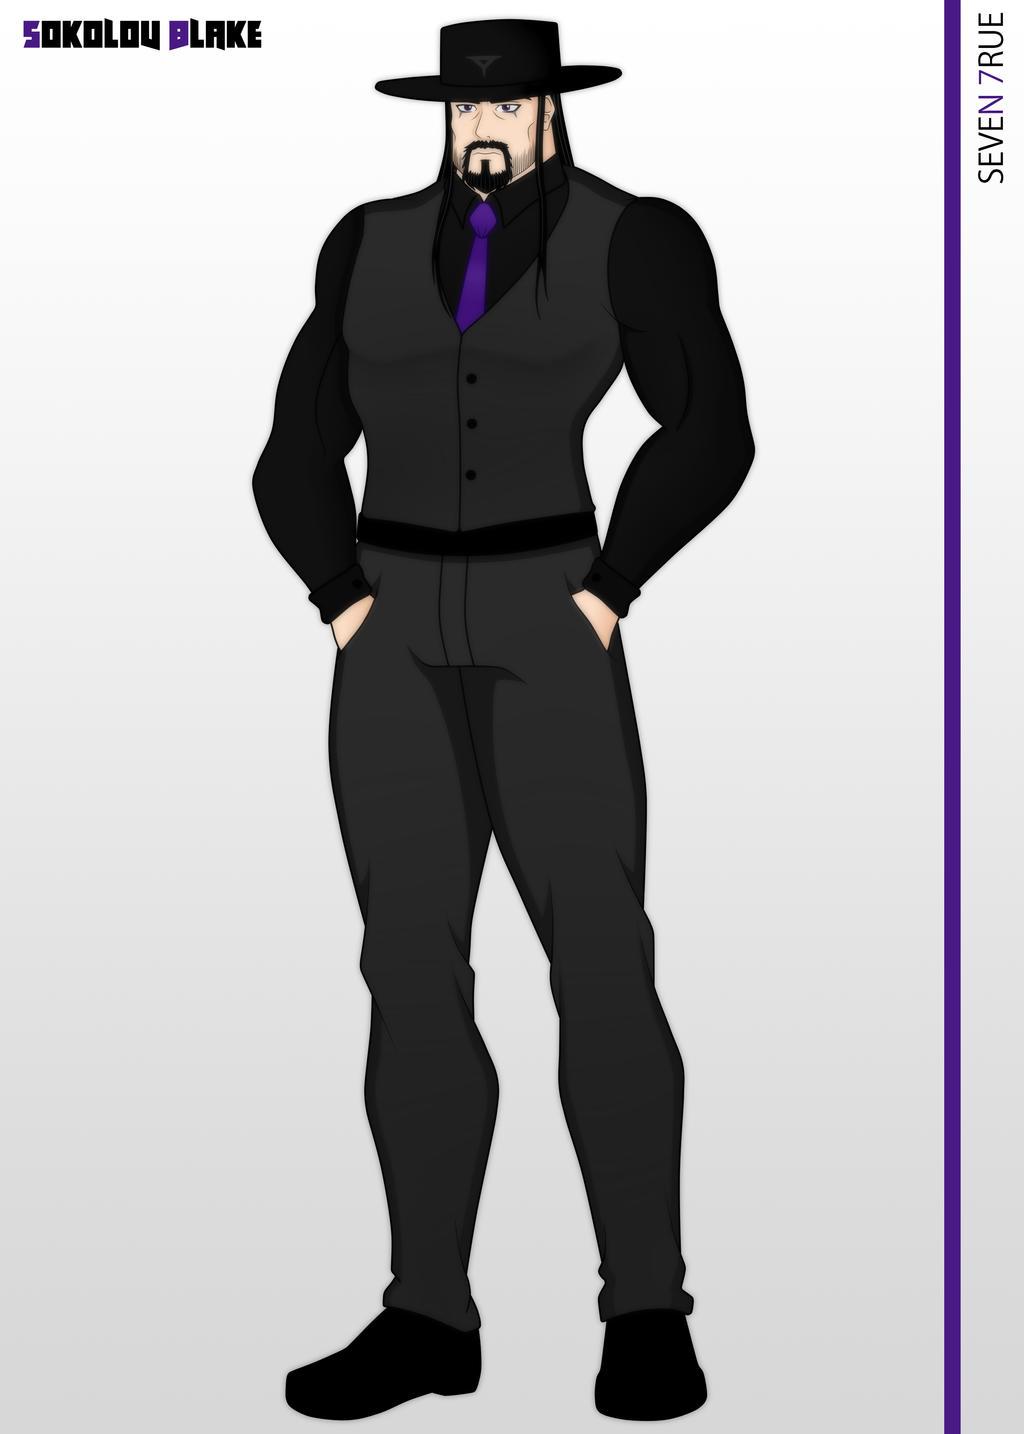 Sokolov Blake - Dimensional Hunter - 2nd Horseman by CFFC2010